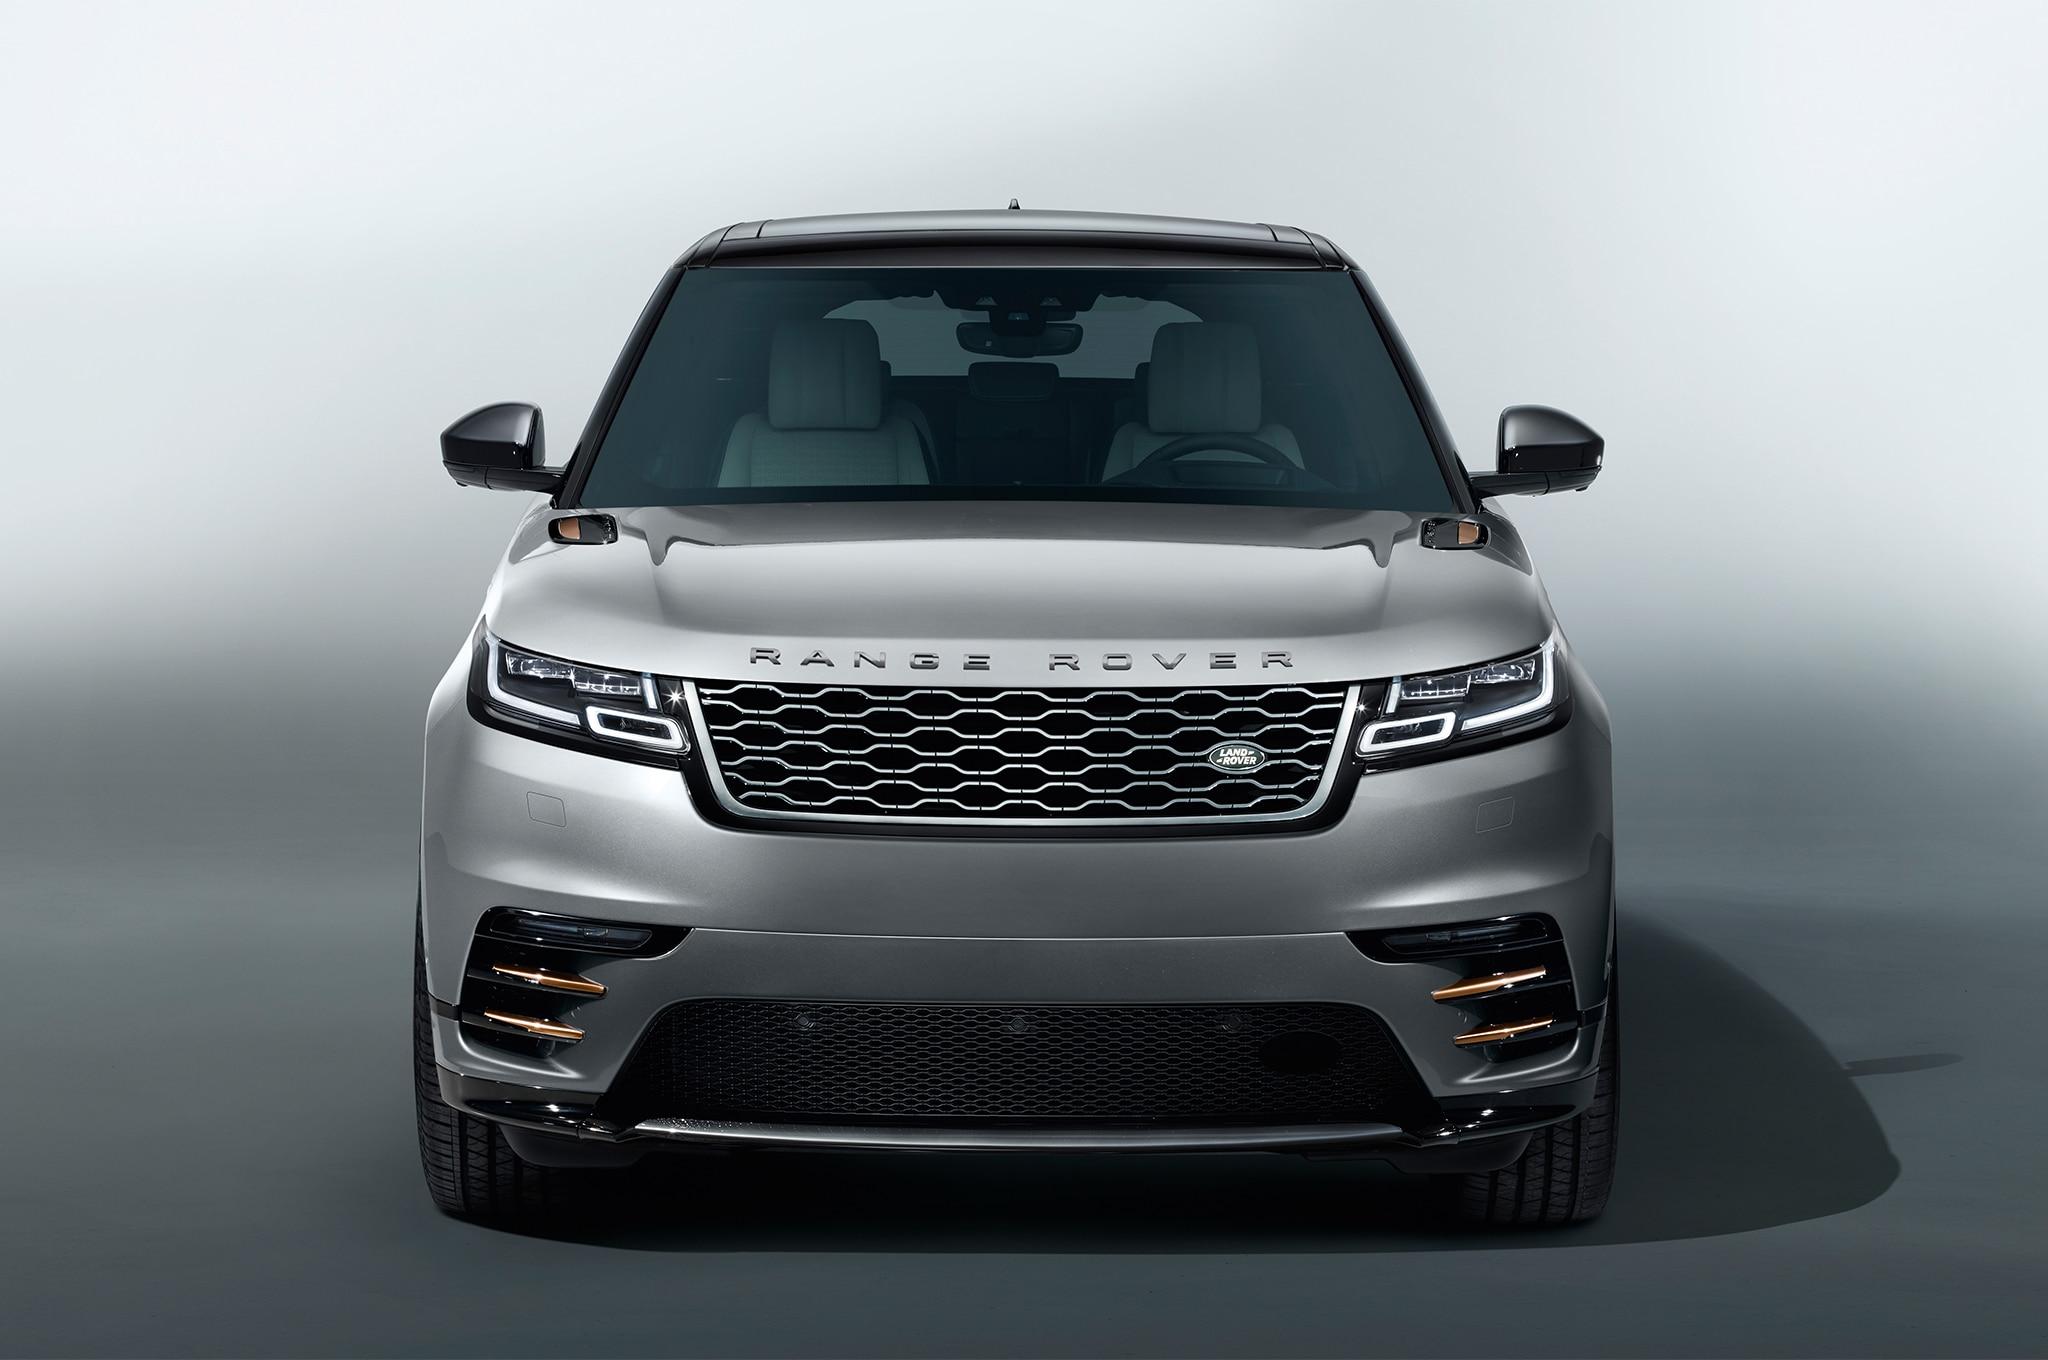 2018 Range Rover Velar Already Gets A Wide Body Kit By Lumma Design